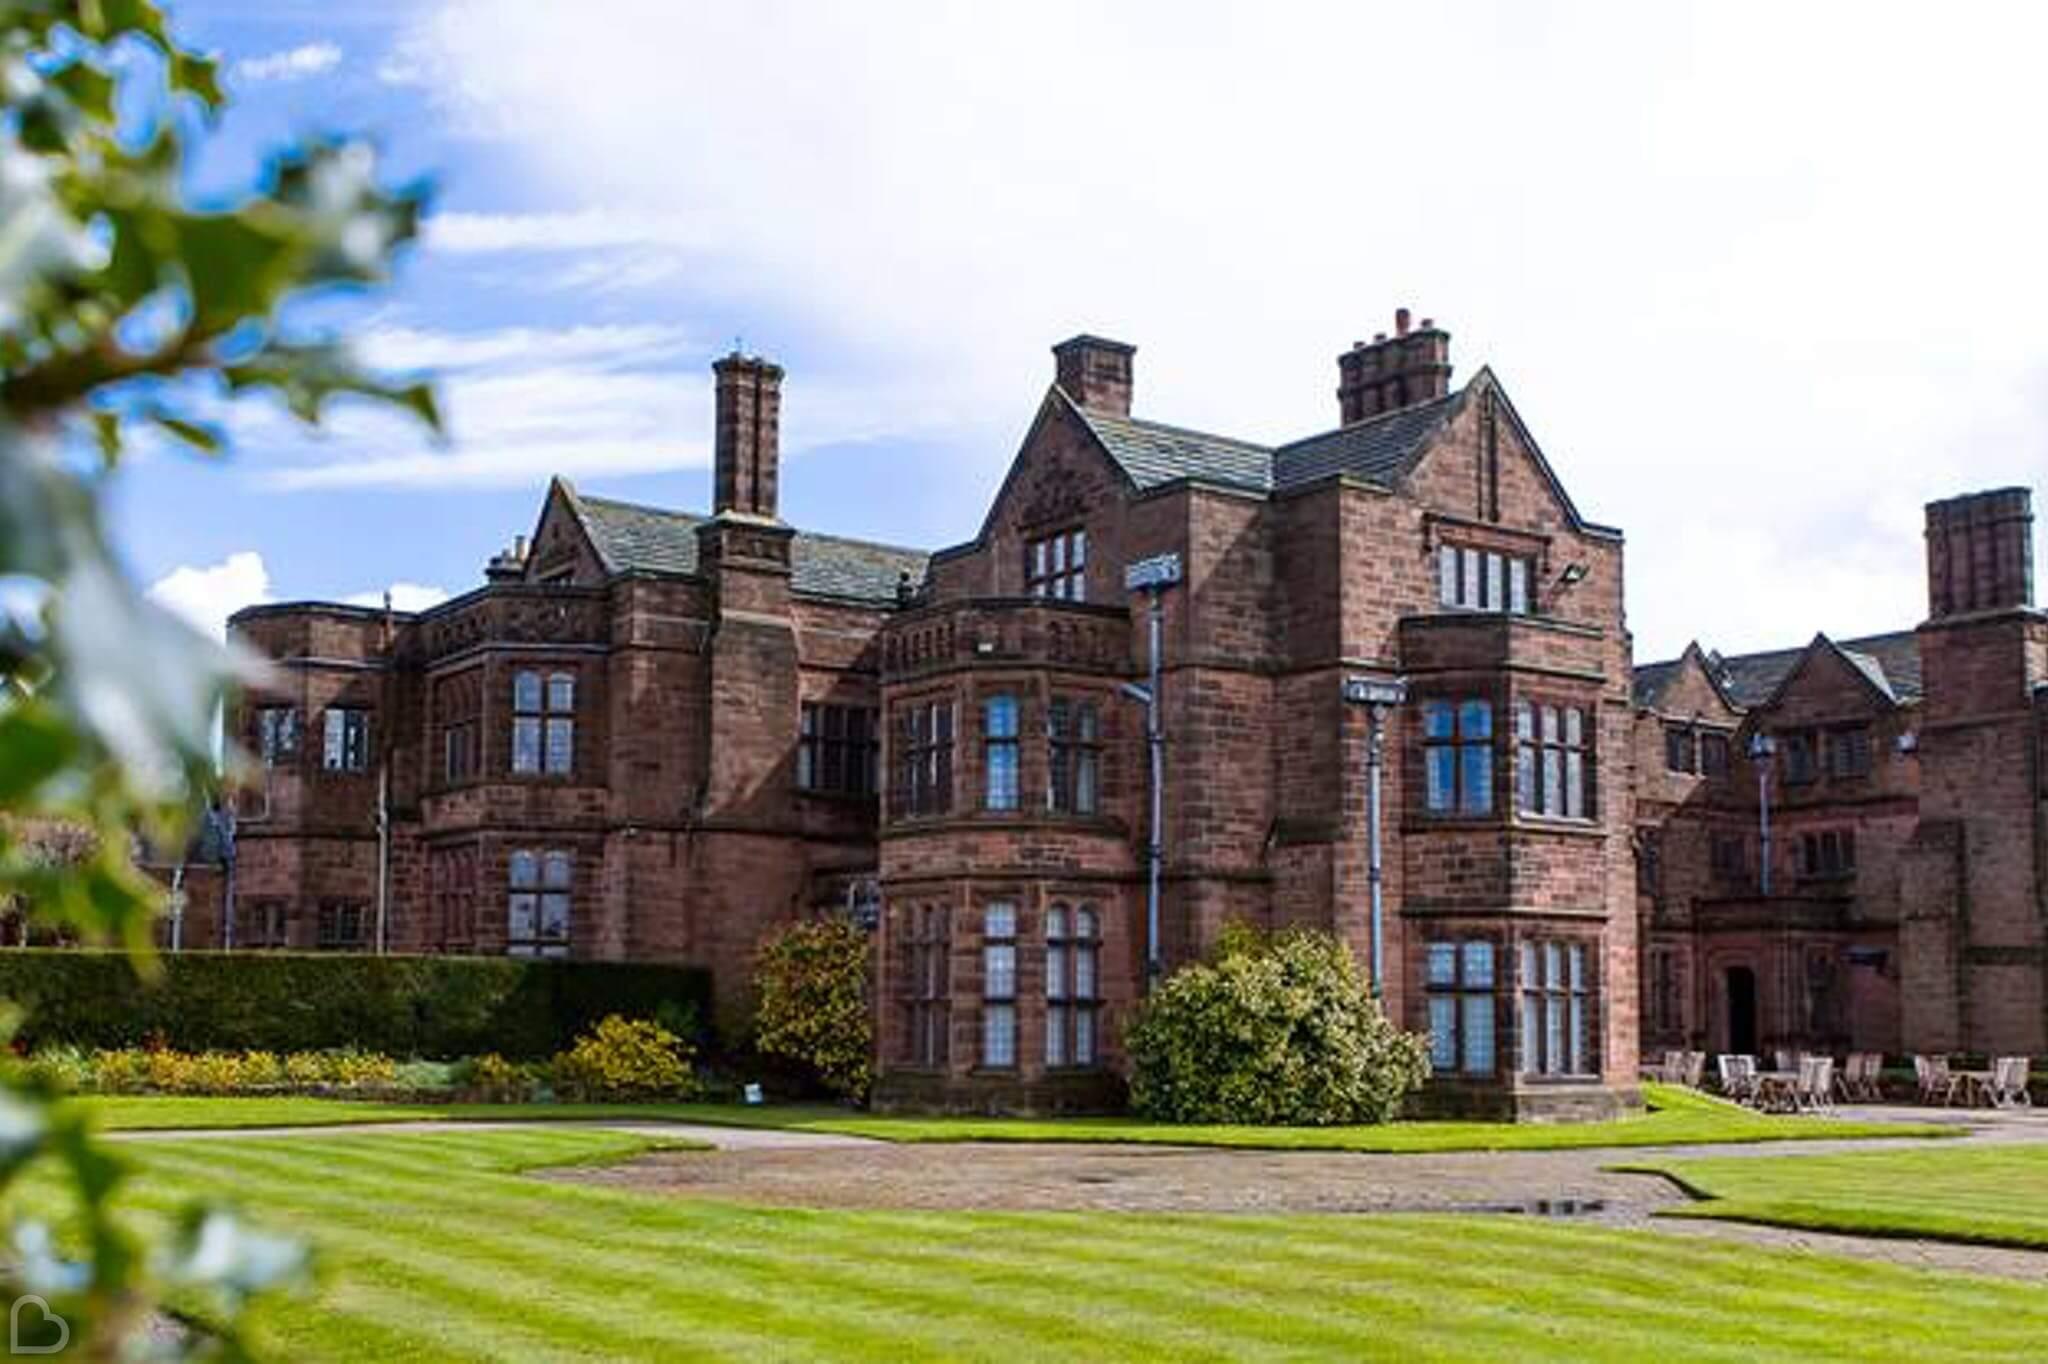 Thornton Manor in Cheshire